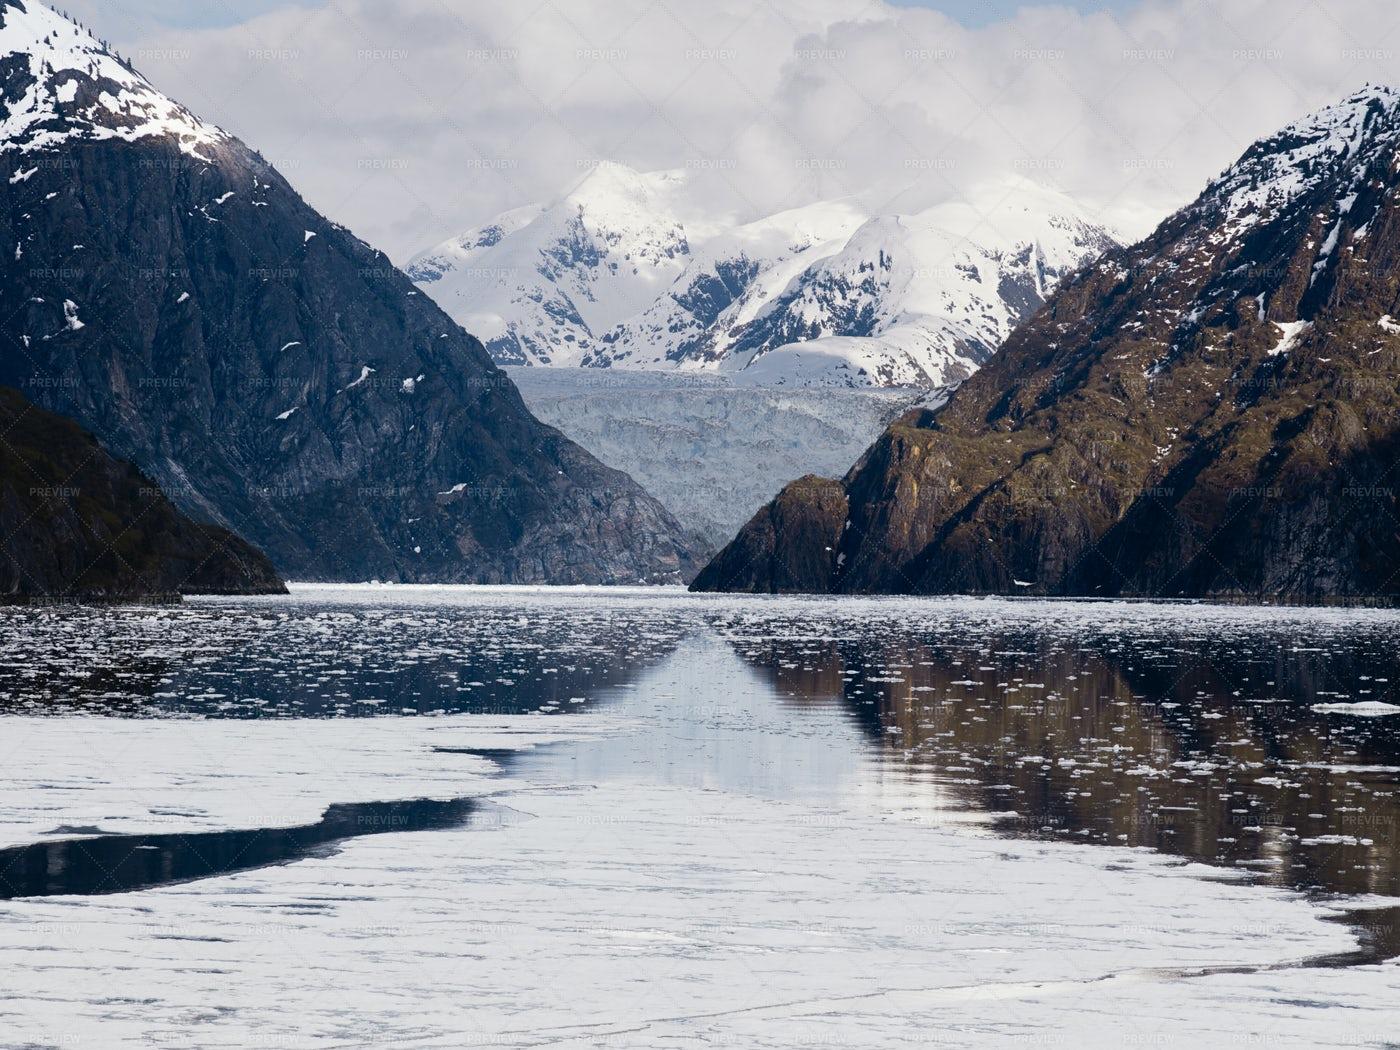 Tracy Arm Fjord And Sawyer Glacier: Stock Photos